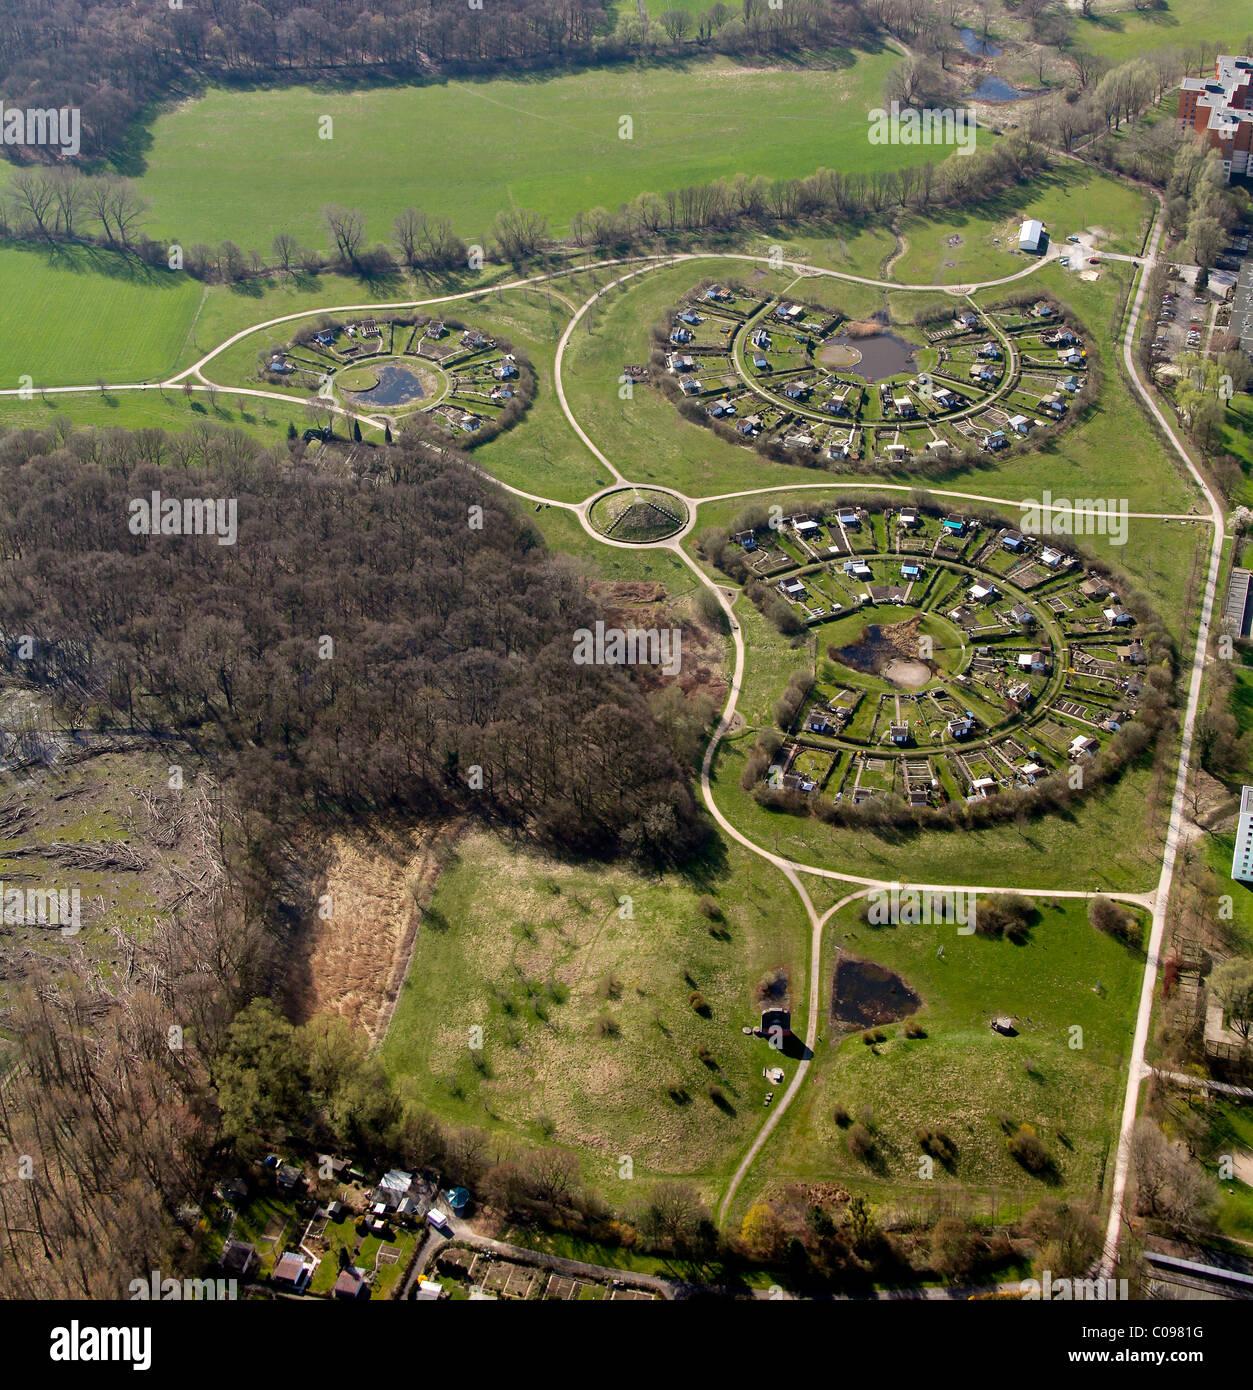 Aerial view, allot settlements, Scharnhorst Grevel district, Werzenkamp street, Dortmund, Ruhr area, North Rhine - Stock Image